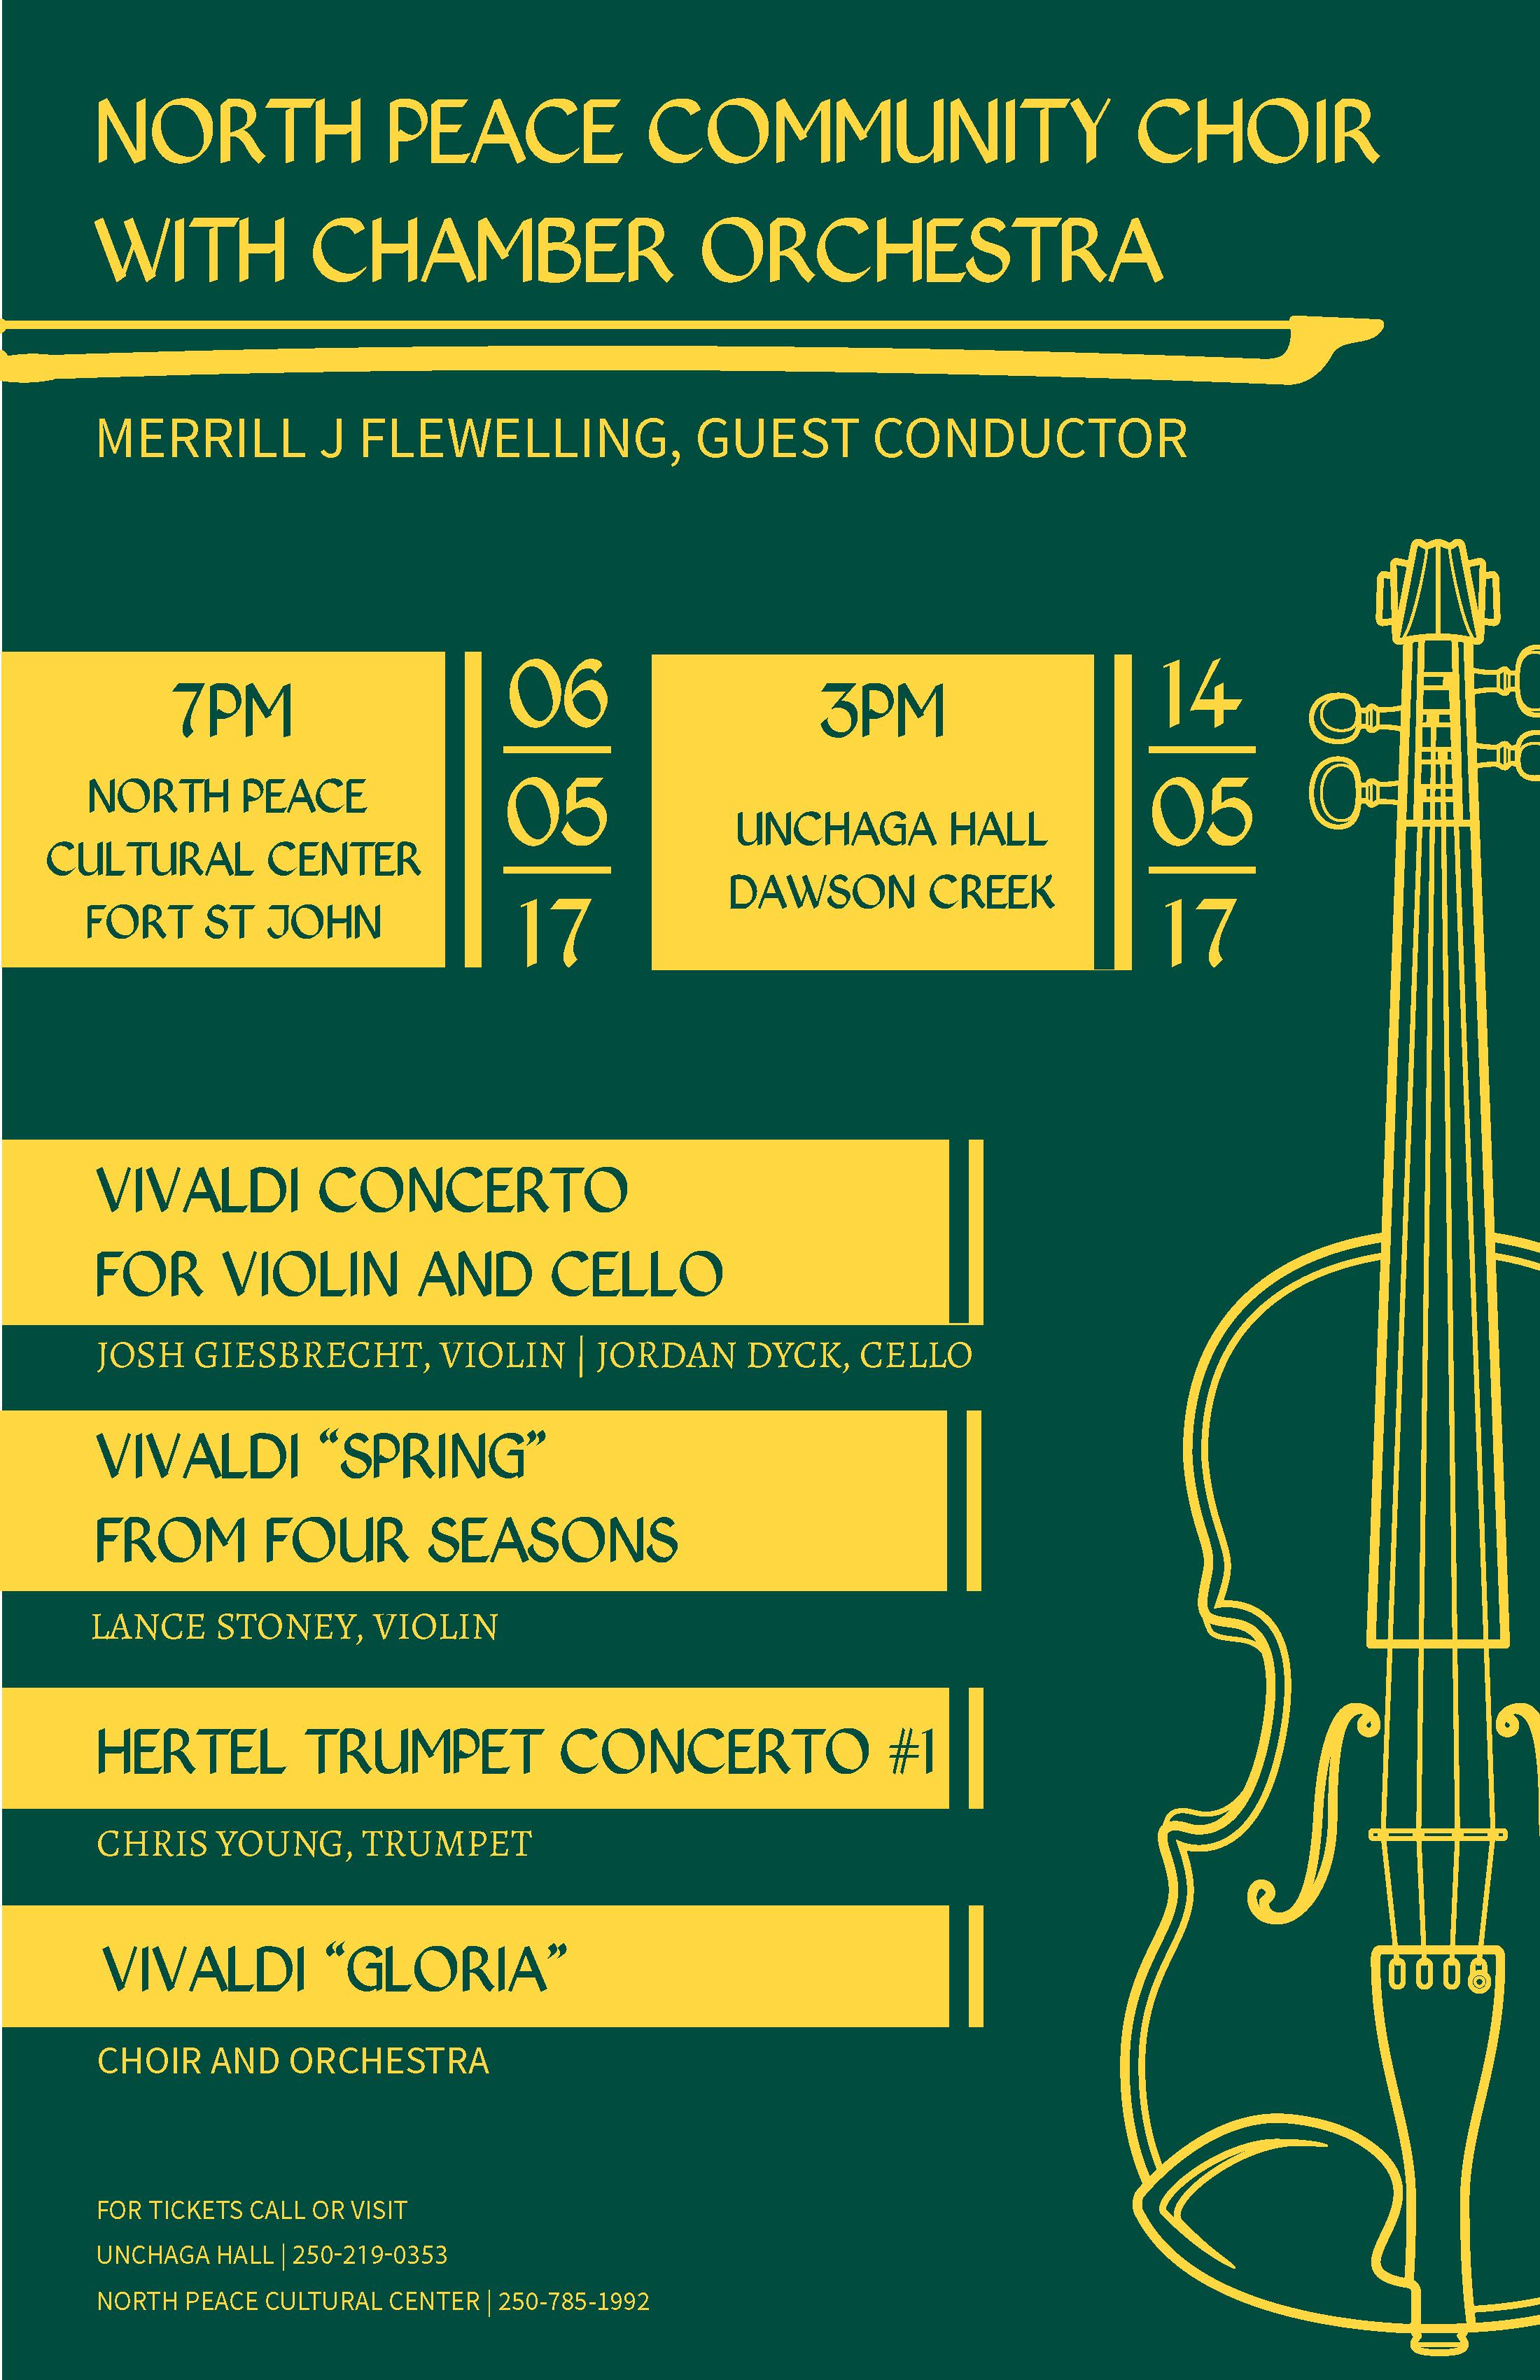 NPCC Spring Vivaldi 11-17